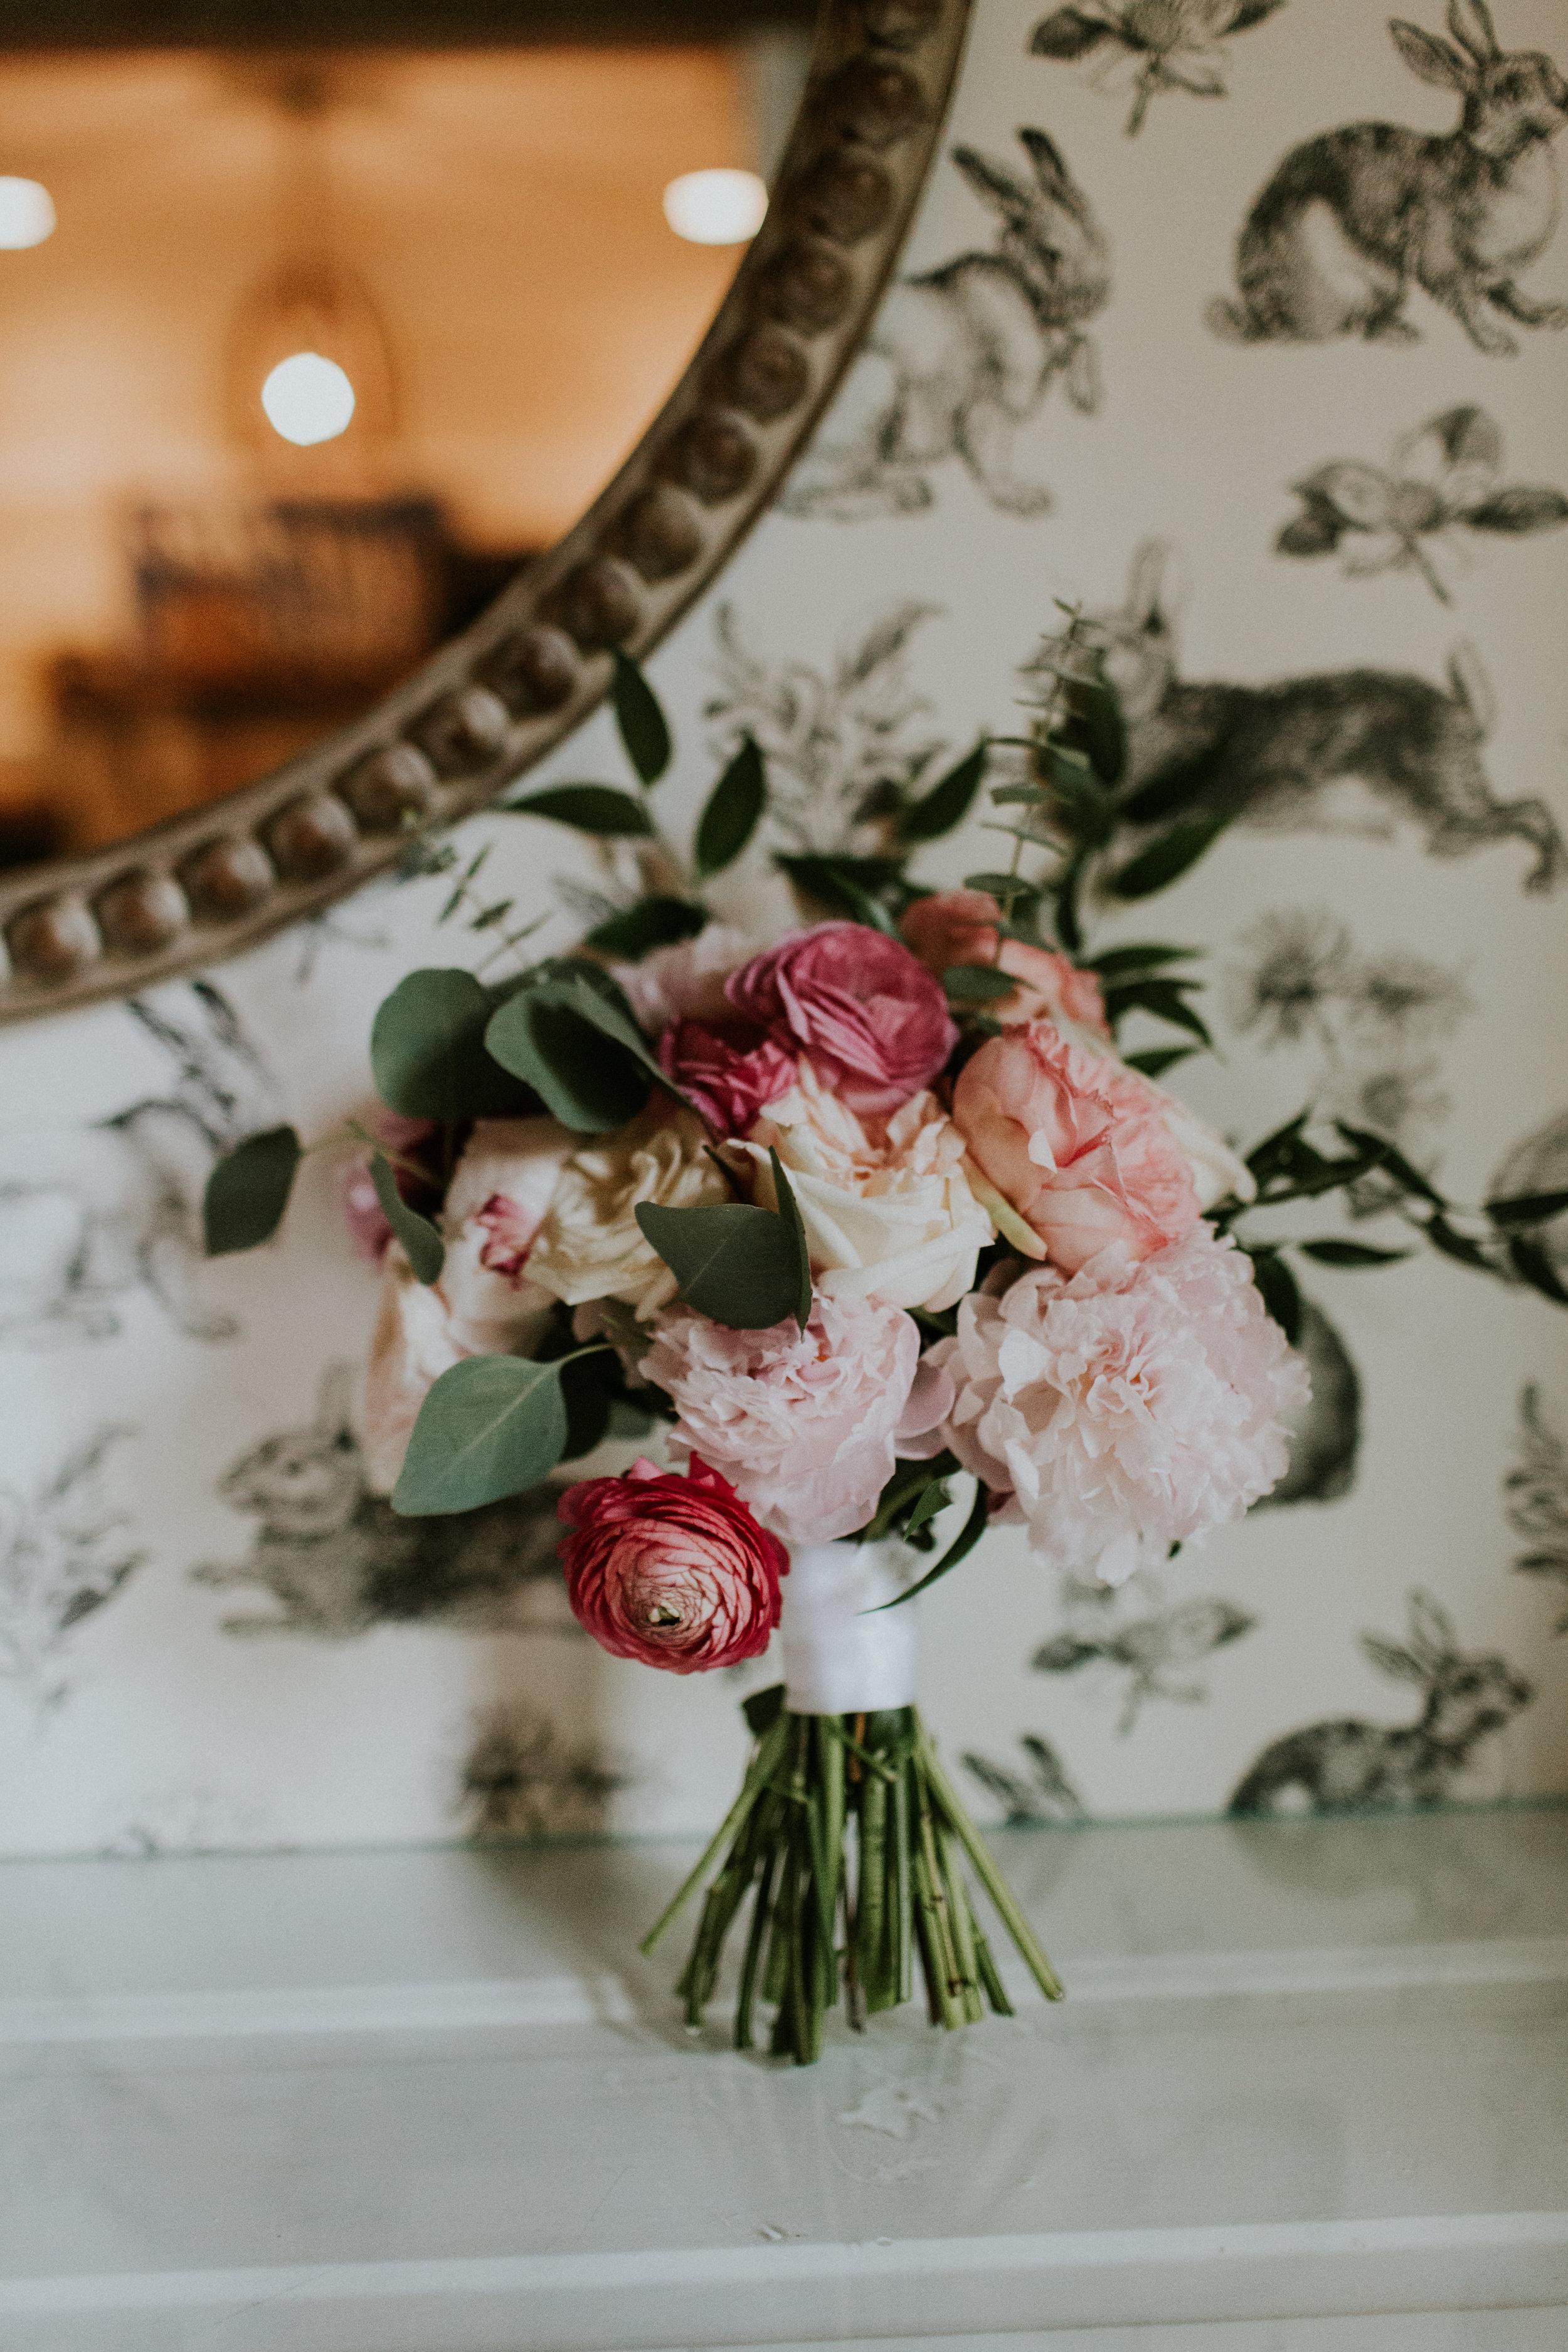 Christian_Reyes_Photography_Triad_NC_Wedding_Photographer-5.jpg